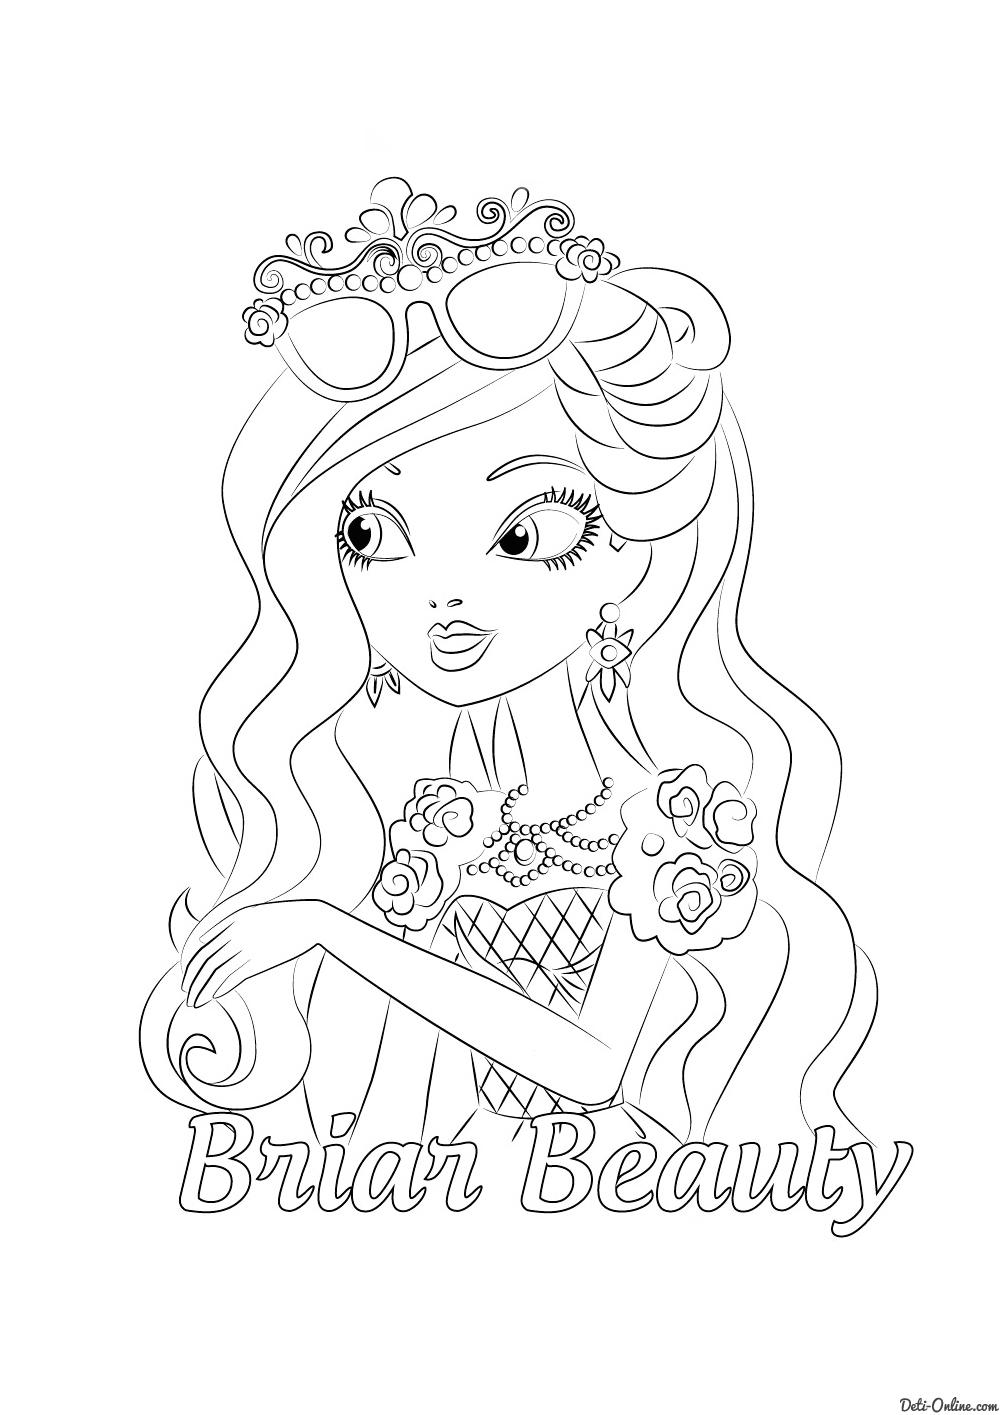 Раскраска Брайер Бьюти- дочь Спящей красавицы